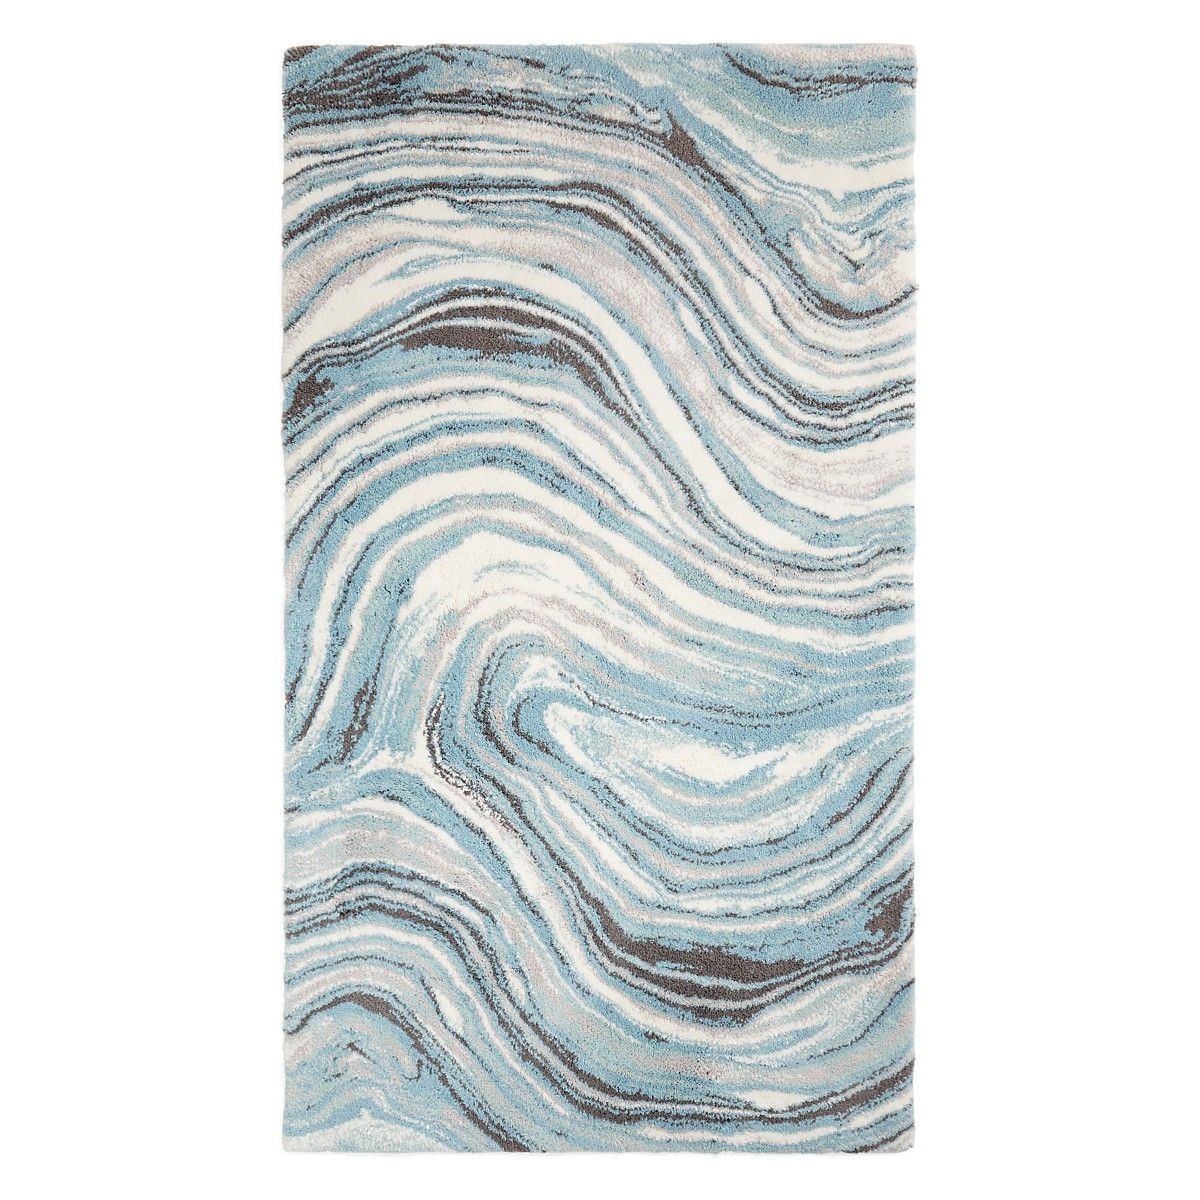 Abyss Gala Bath Rug Bath Towels Bloomingdale S Rugs Blue Bath Rug Bath Rug [ 1200 x 1200 Pixel ]